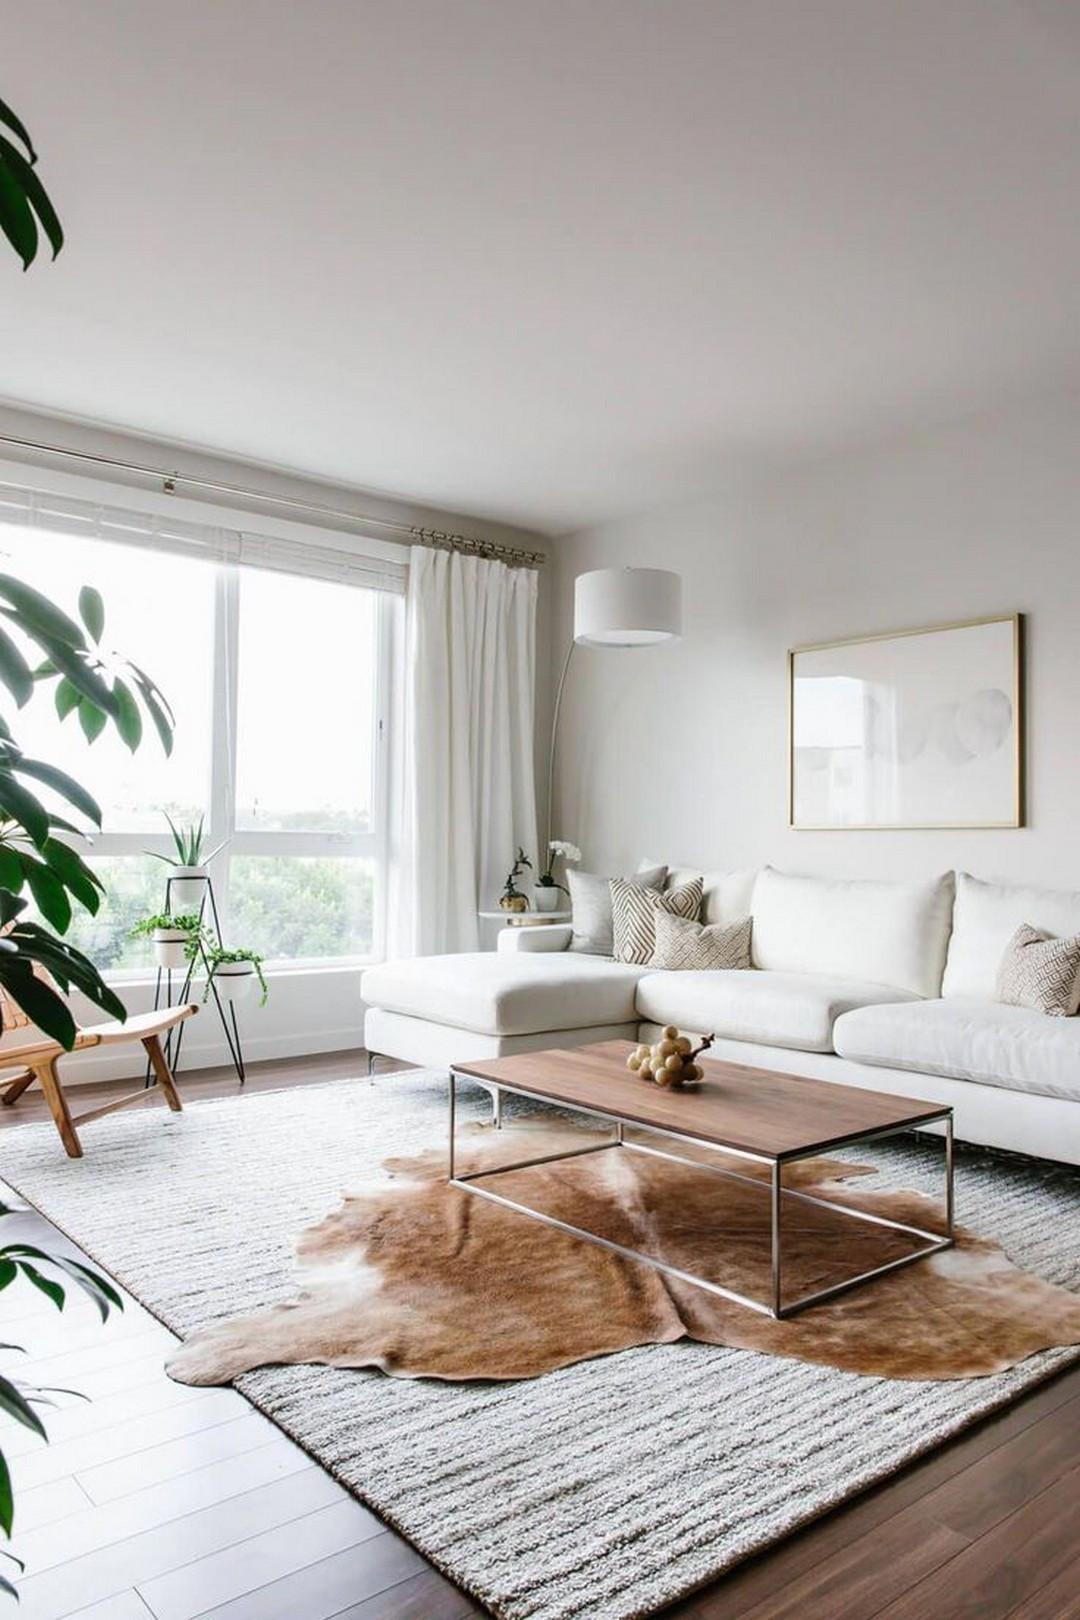 Minimalist Design Living Room New 20 Take A tour My Modern and Minimalist Living Room